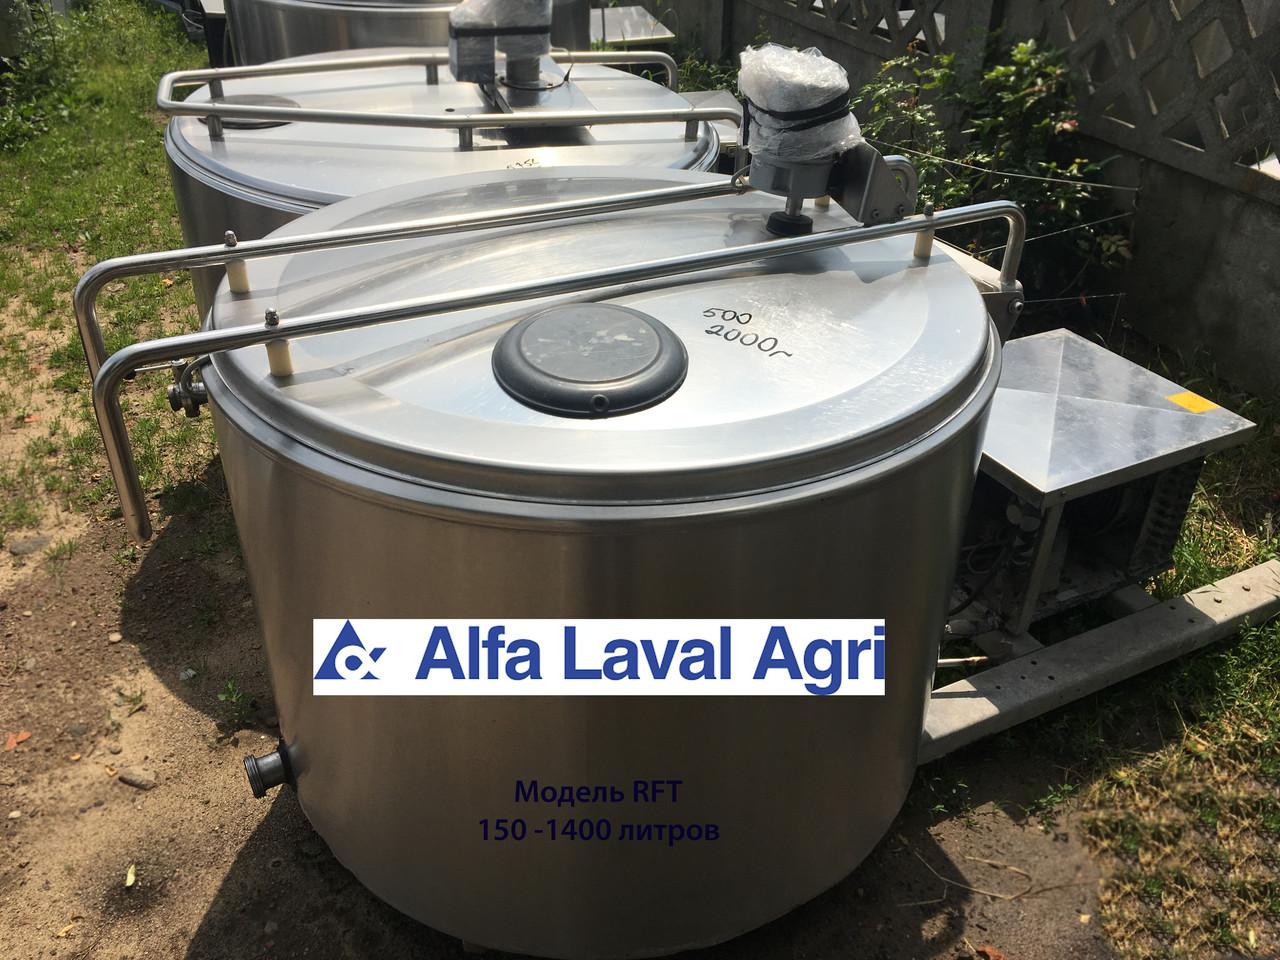 Охладители молока Alfa Laval. Модель RFT. Характеристики и описание.